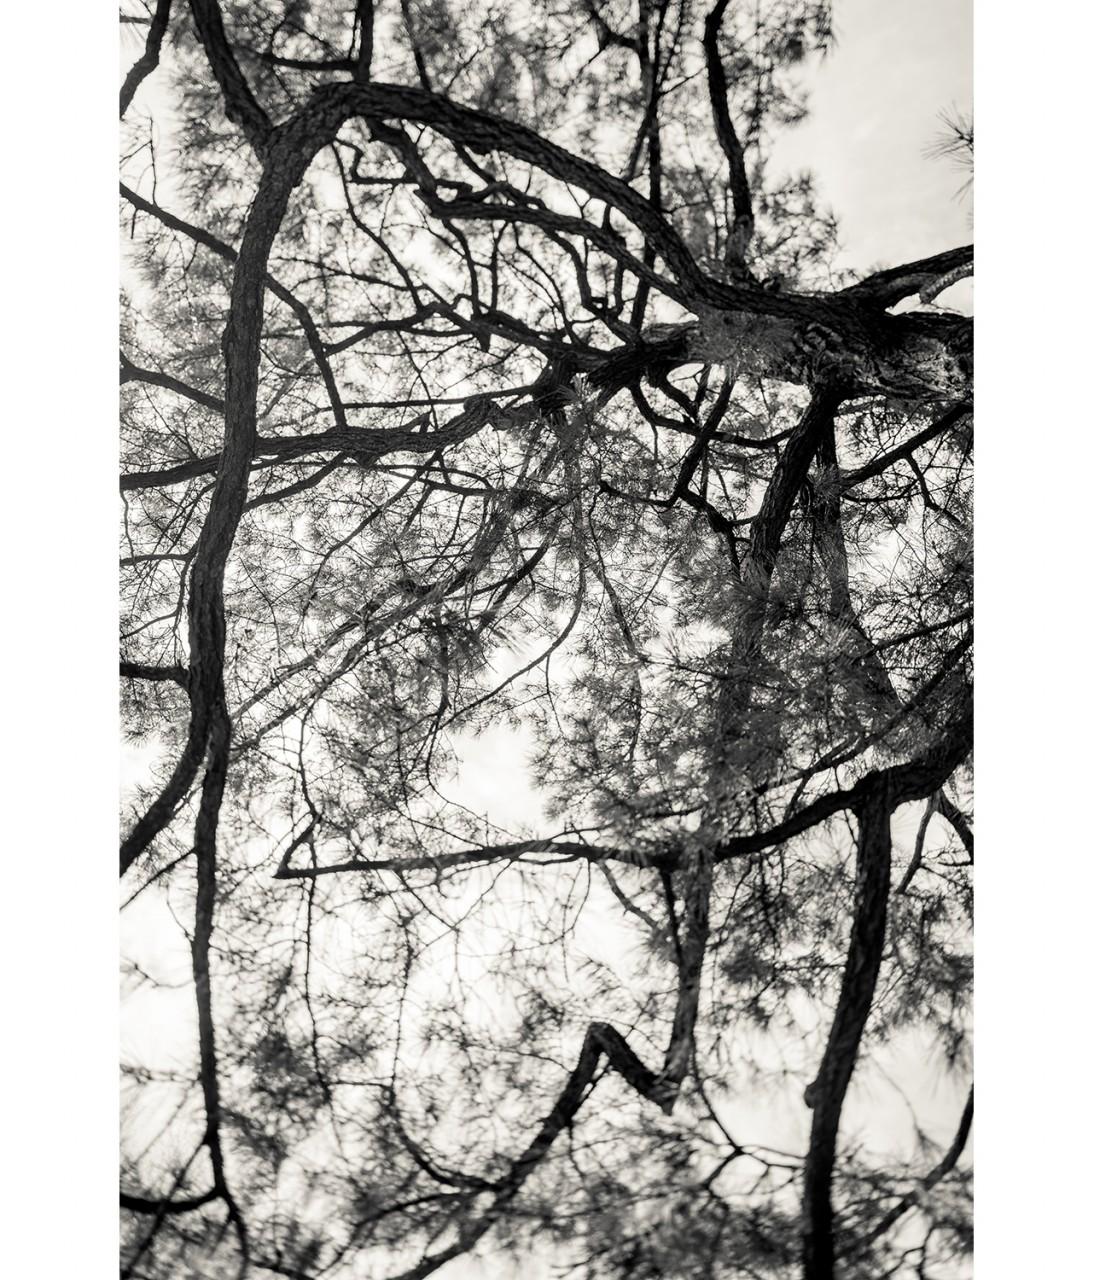 23_Untitled 1064